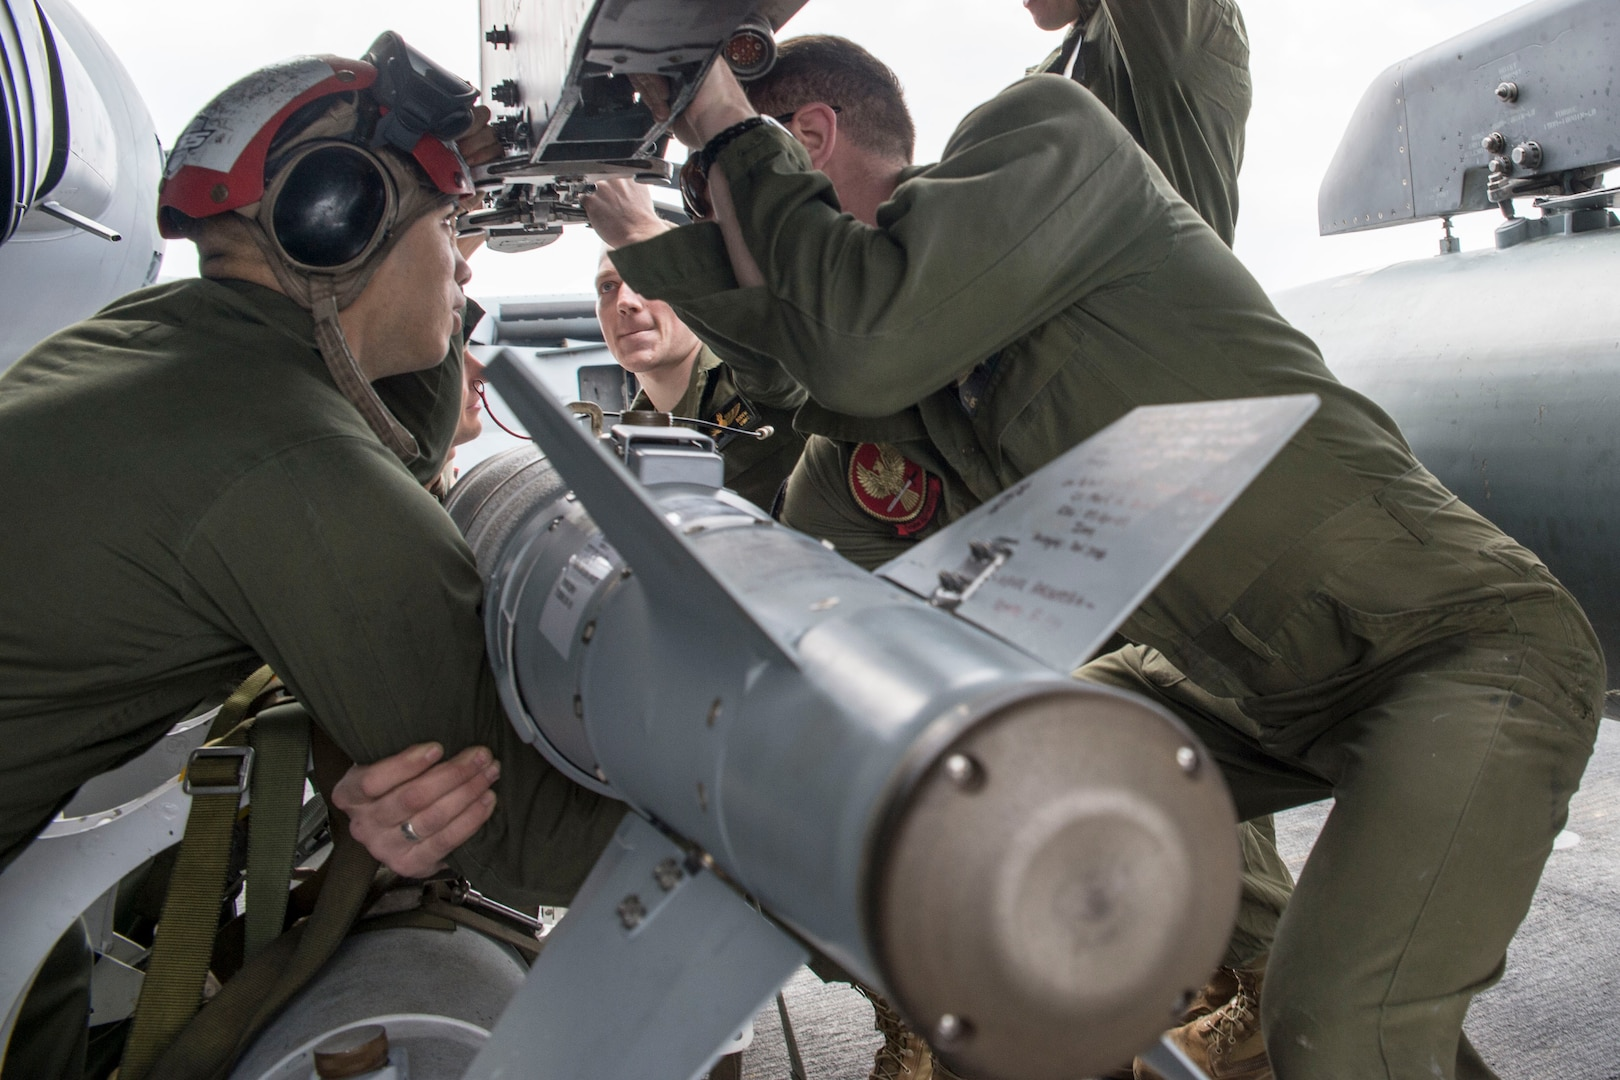 Marines attached to 26th Marine Expeditionary Unit load GBU-54 bomb onto AV-8B Harrier on flight deck of USS Kearsarge, supporting Operation Inherent Resolve, Arabian Gulf, December 28, 2015 (U.S. Navy/Tyler Preston)